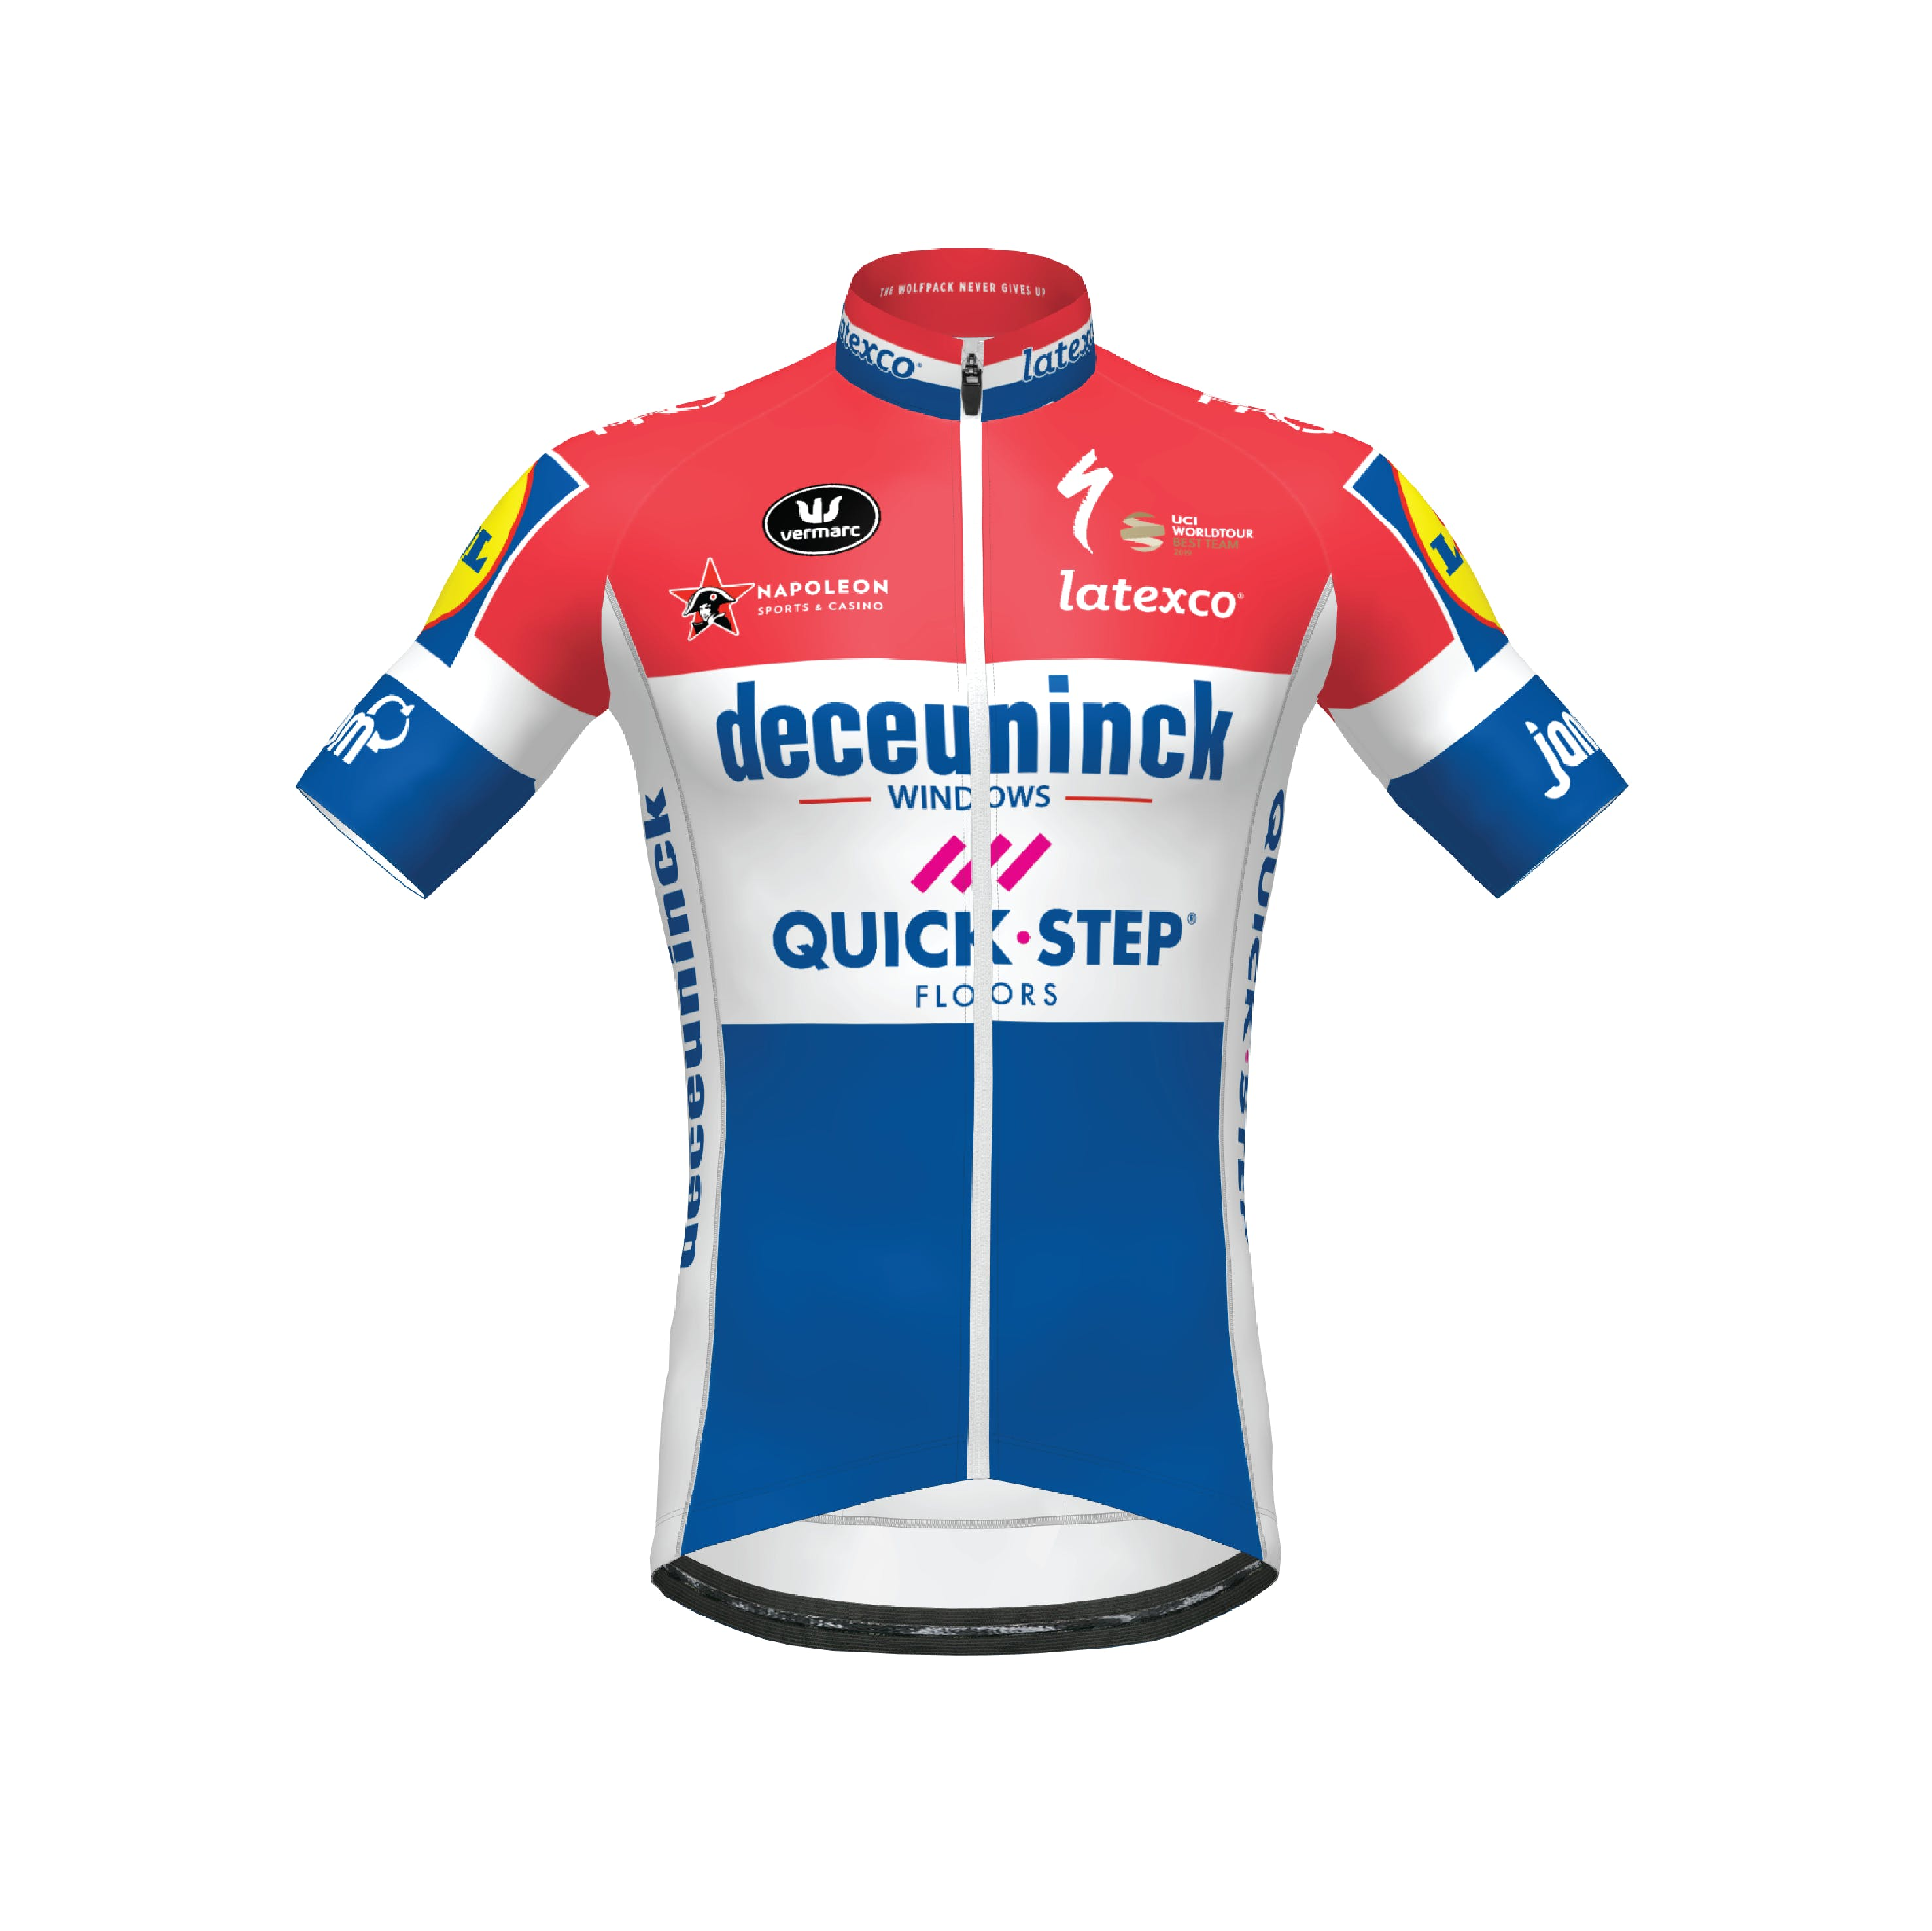 Deceuninck Quick-Step 2020 Champion Netherlands Jersey Short Sleeves Aero